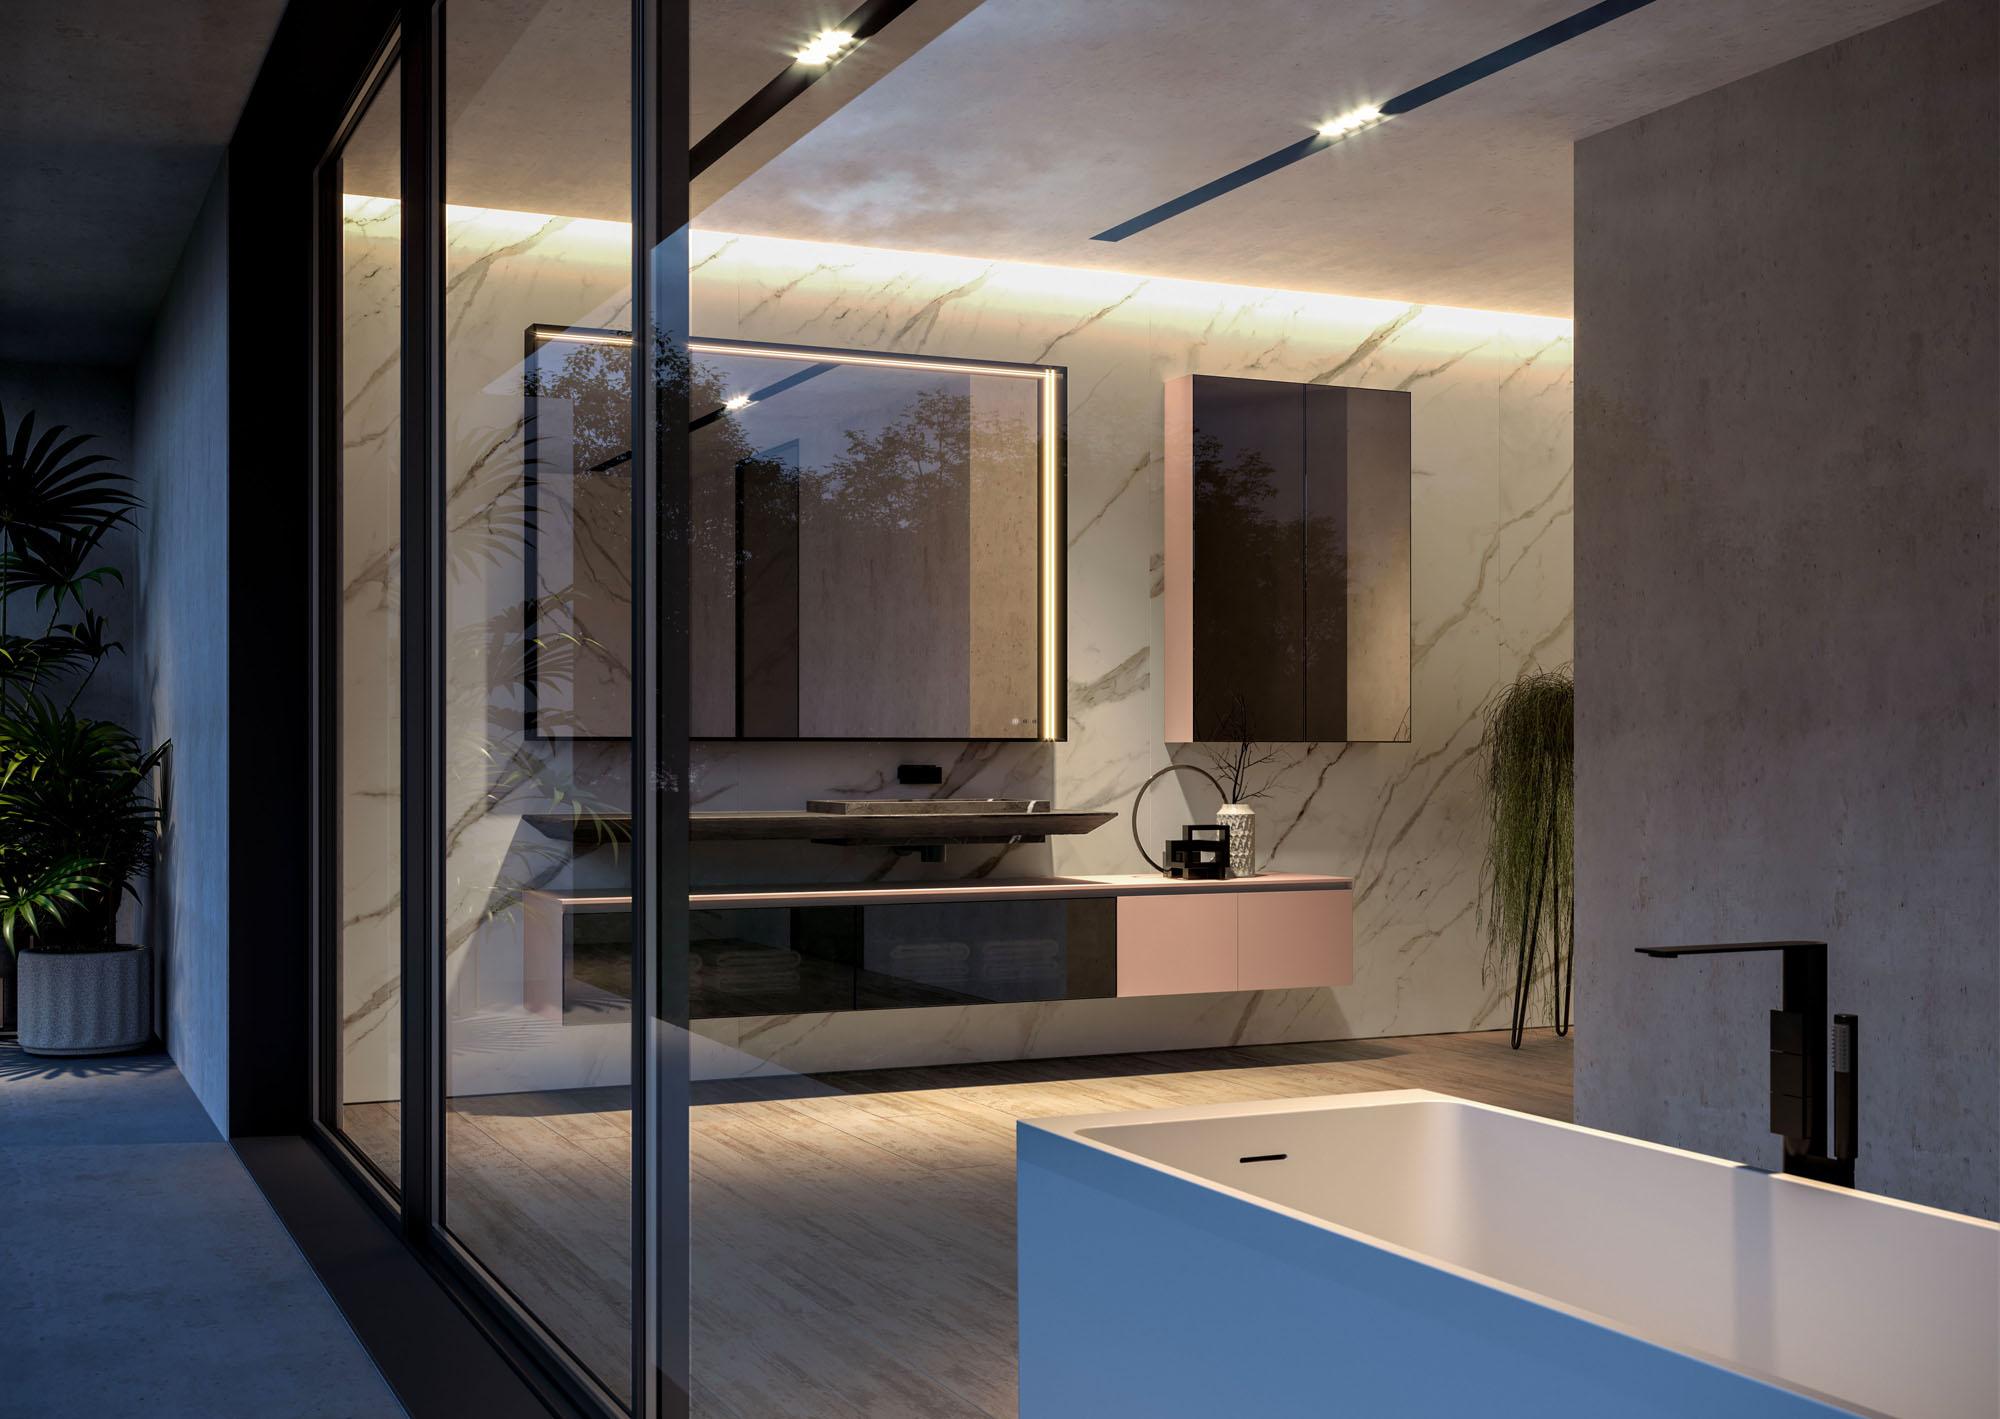 Piano Per Mobile Bagno cubik: modern furniture for designer bathroom décor - ideagroup